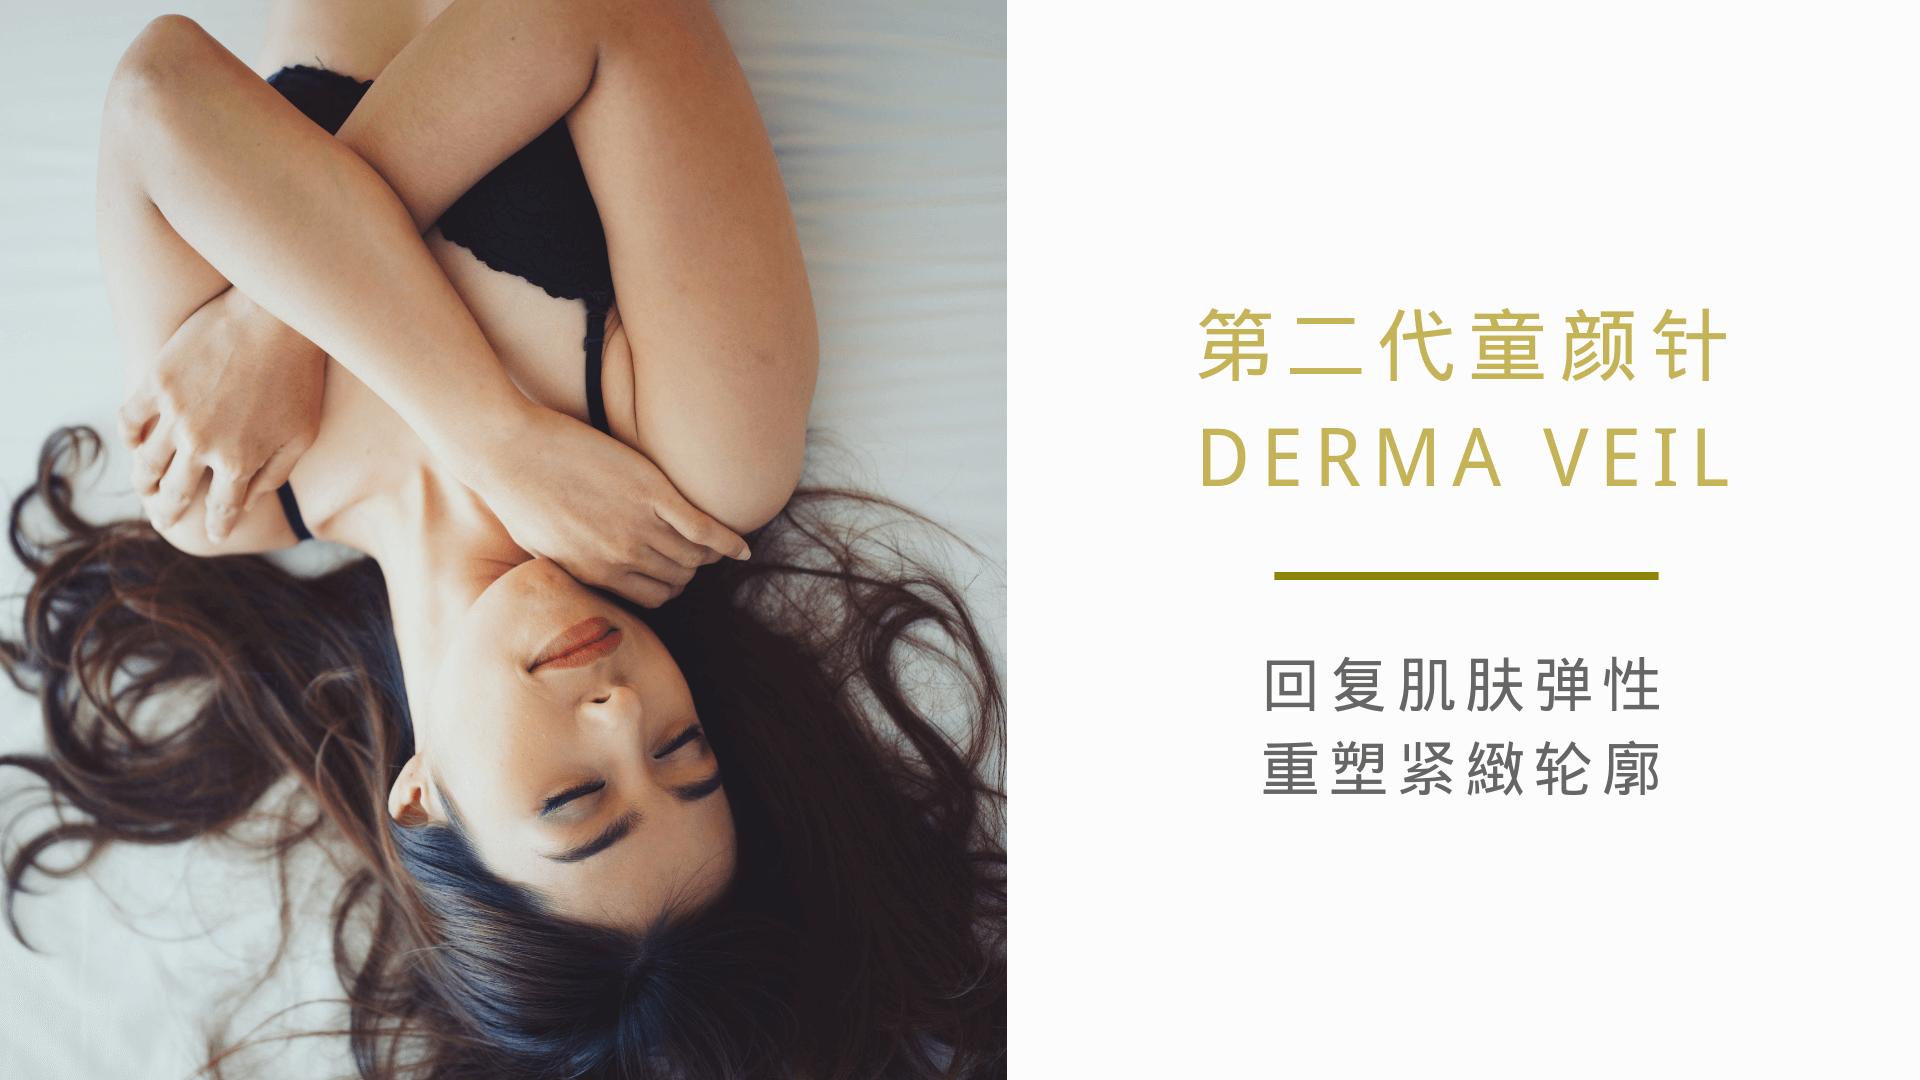 Derma Veil 第二代童颜针